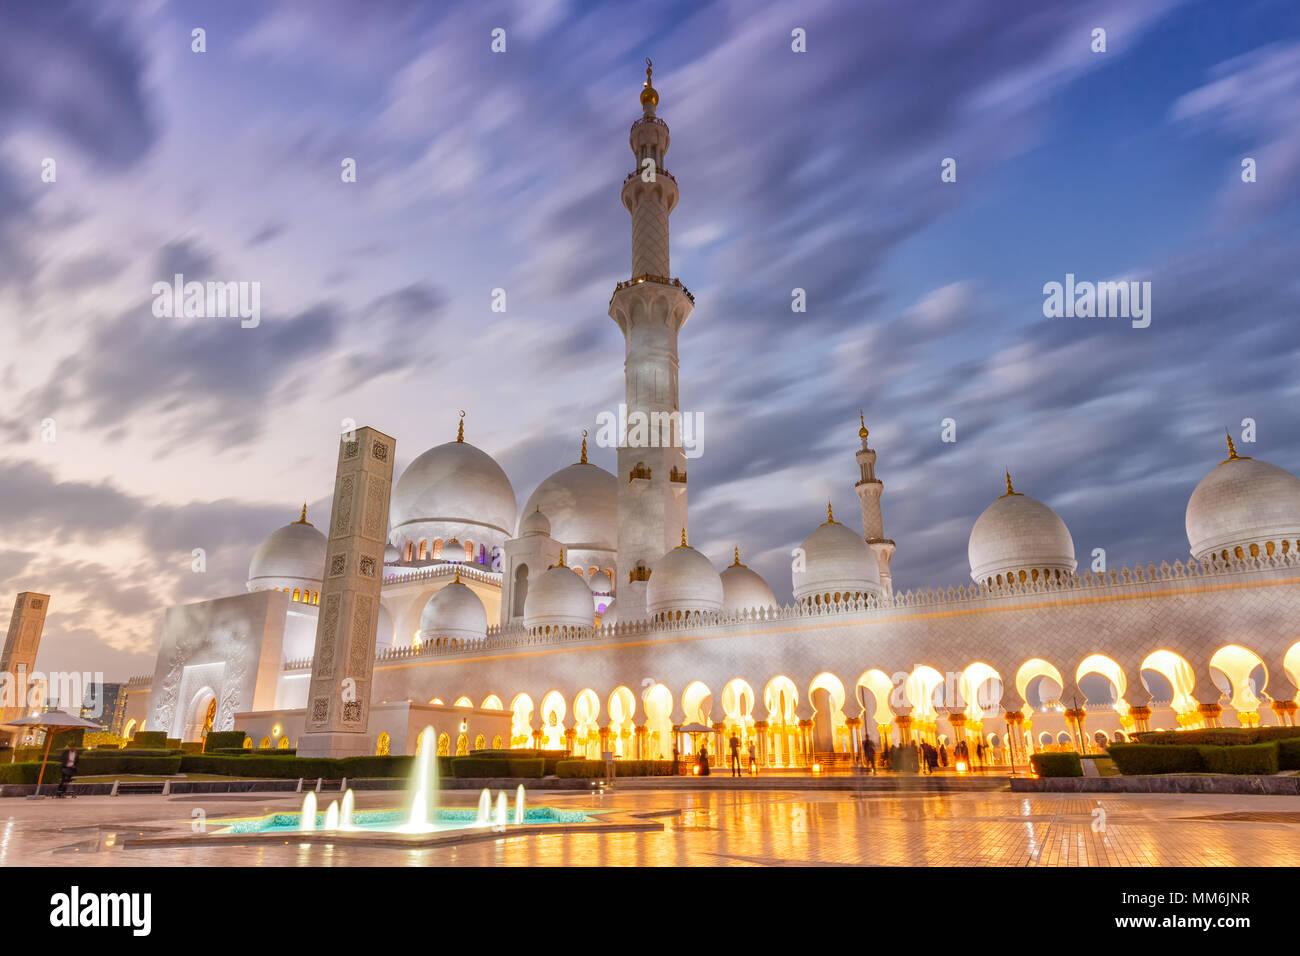 Abu Dhabi Mezquita Sheikh Zayed twilight minarete Emiratos Arabes Unidos UAE Imagen De Stock